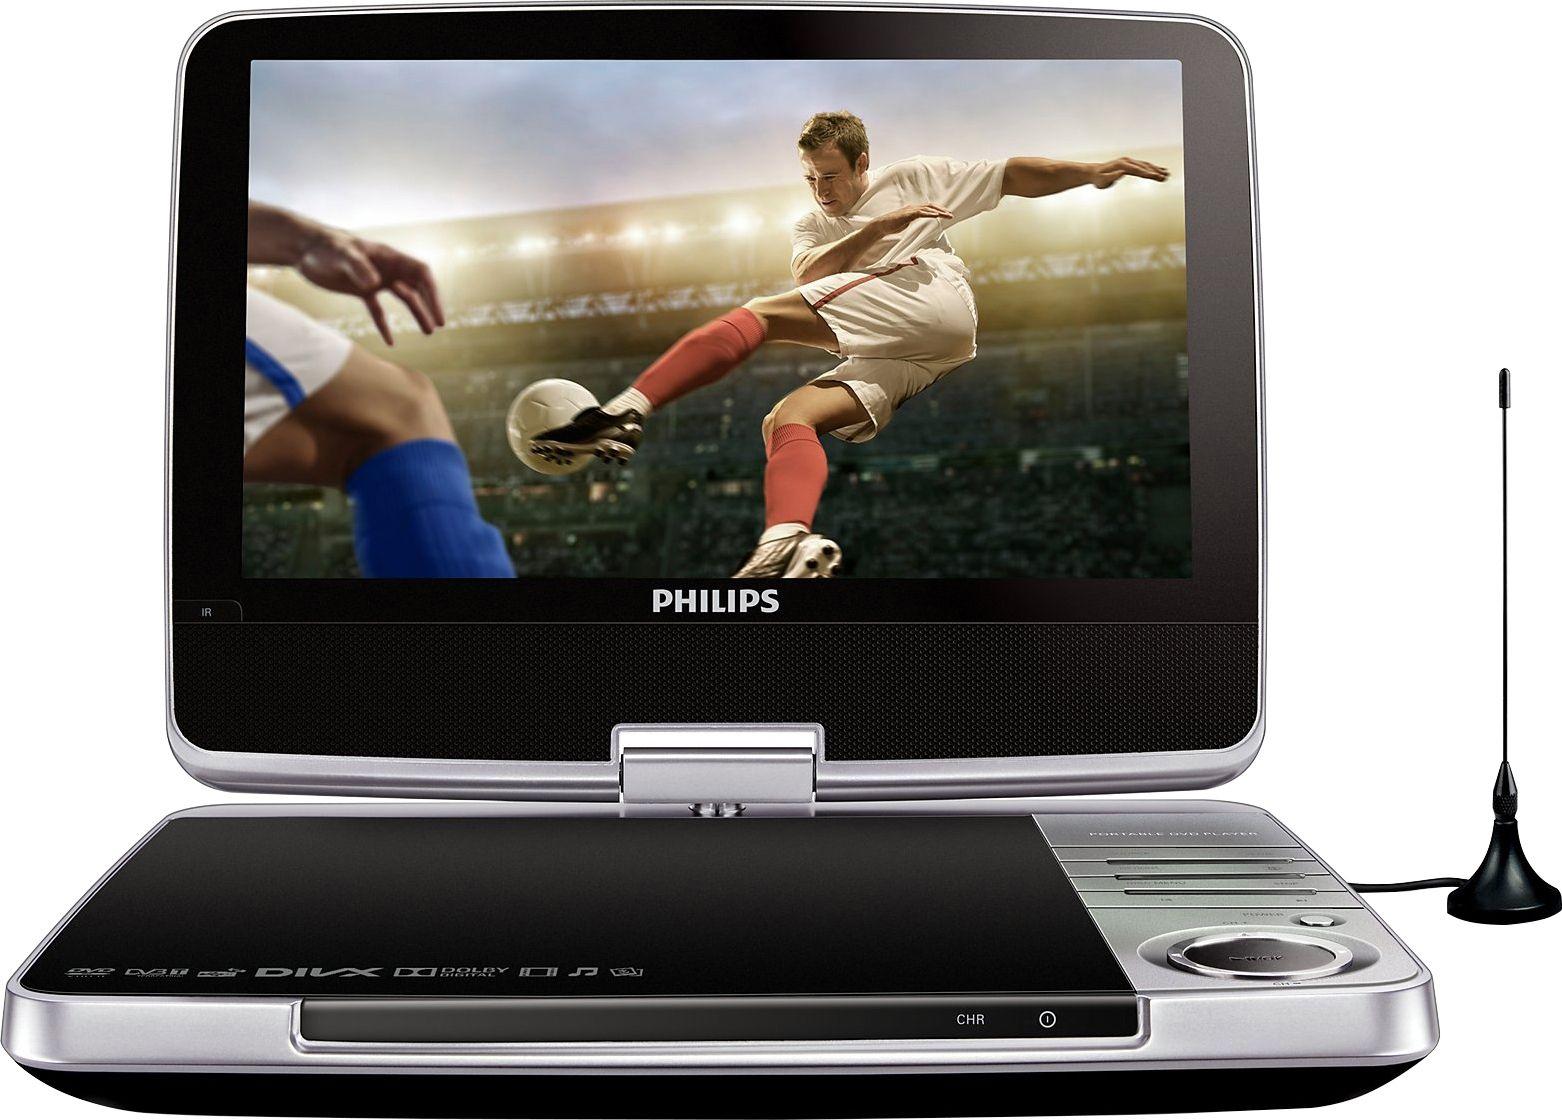 philips pd9025 tragbarer dvd player fernseher dvb t schwab versand tragbarer dvd player. Black Bedroom Furniture Sets. Home Design Ideas